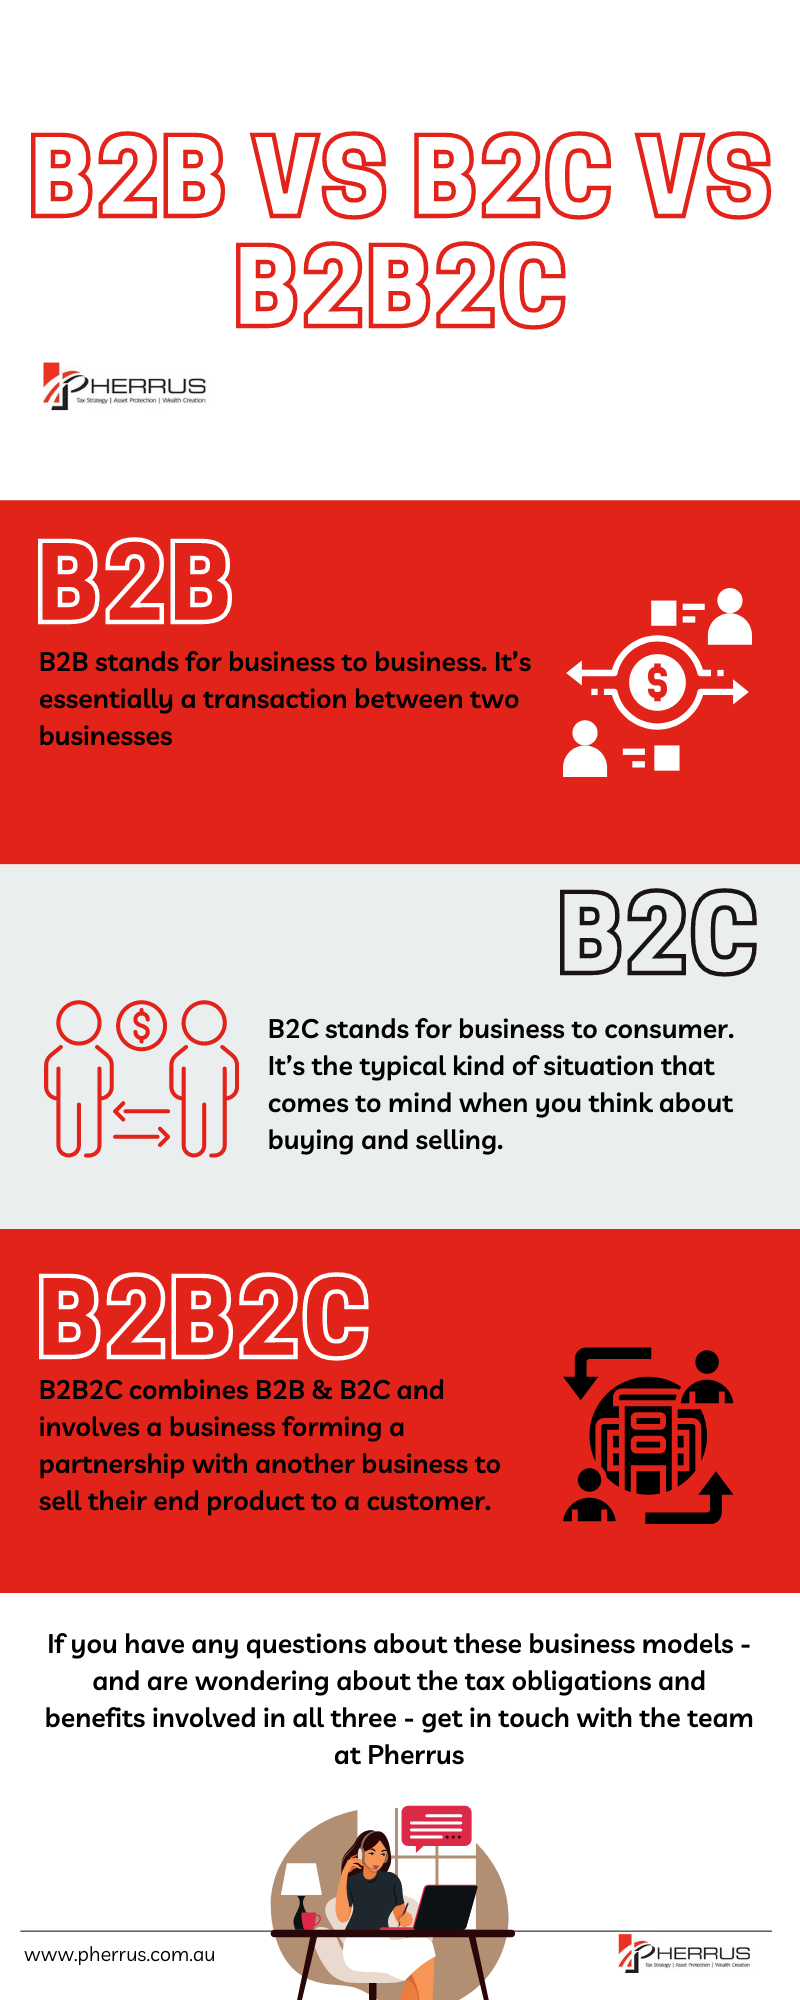 b2b vs b2c vs b2b2c Infographic